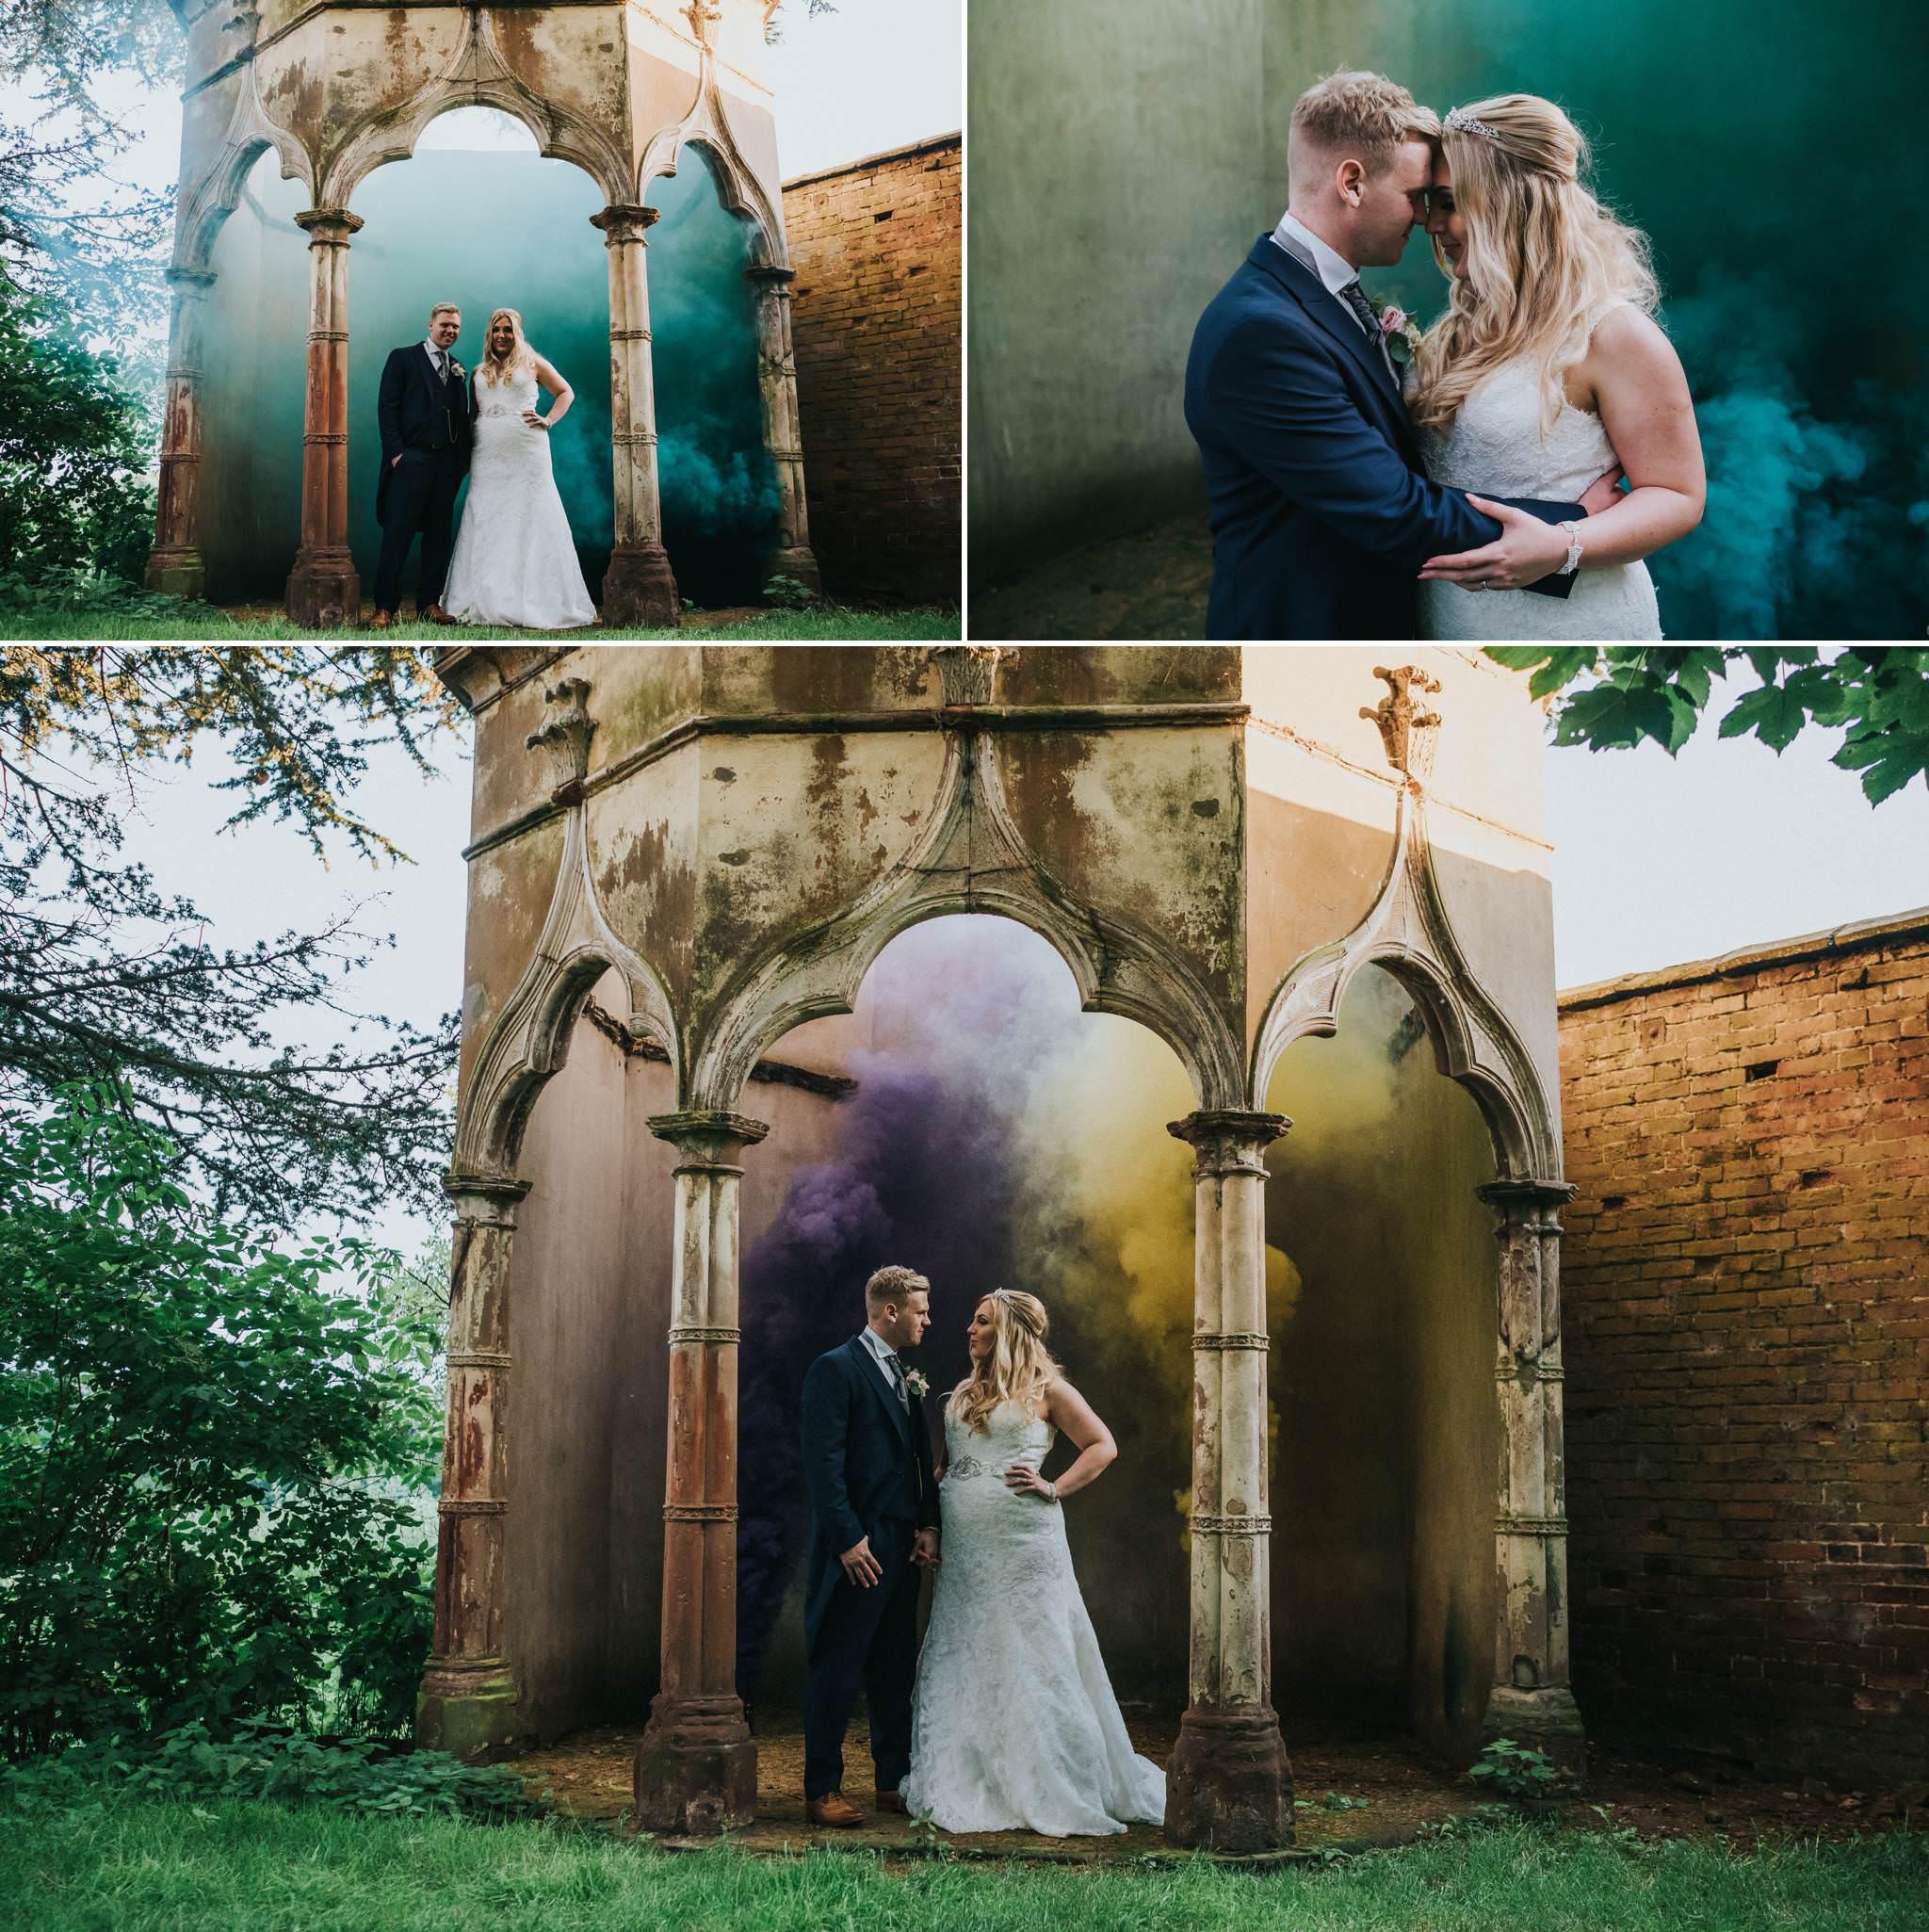 somerford-hall-wedding-photography 19.jpg